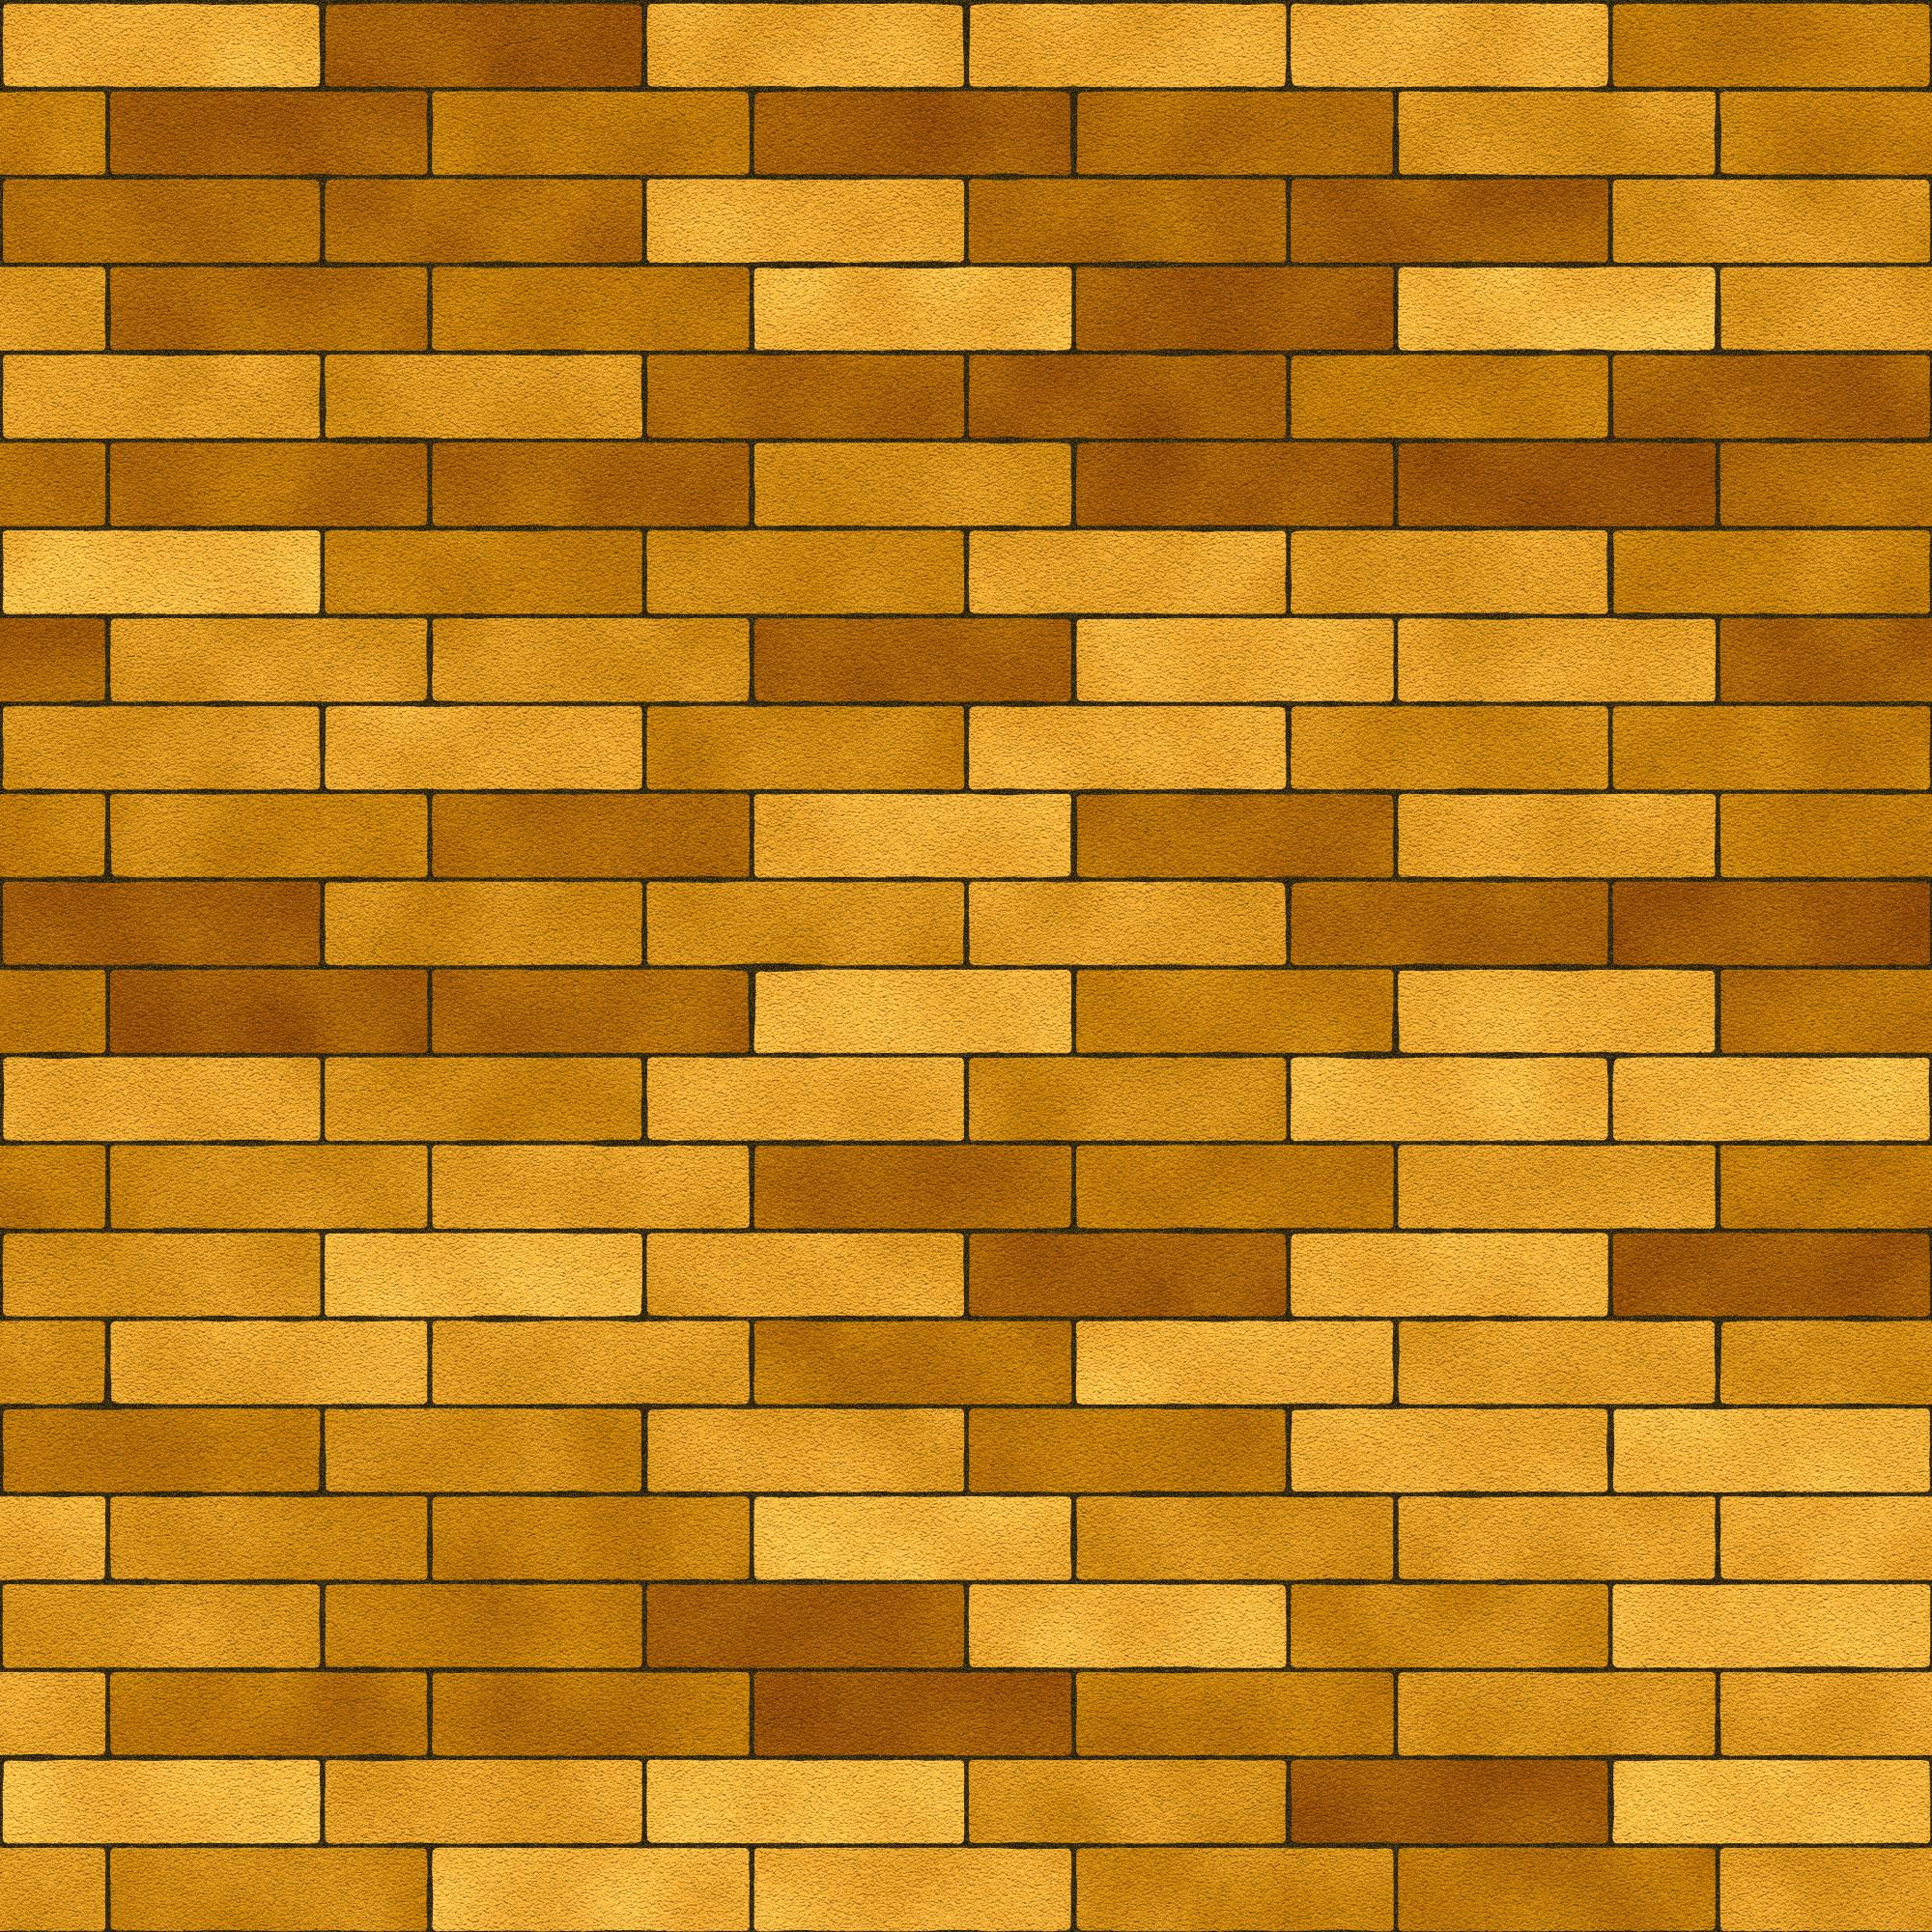 yellow brick wall texture, yellow brick wall, download photo, background, texture